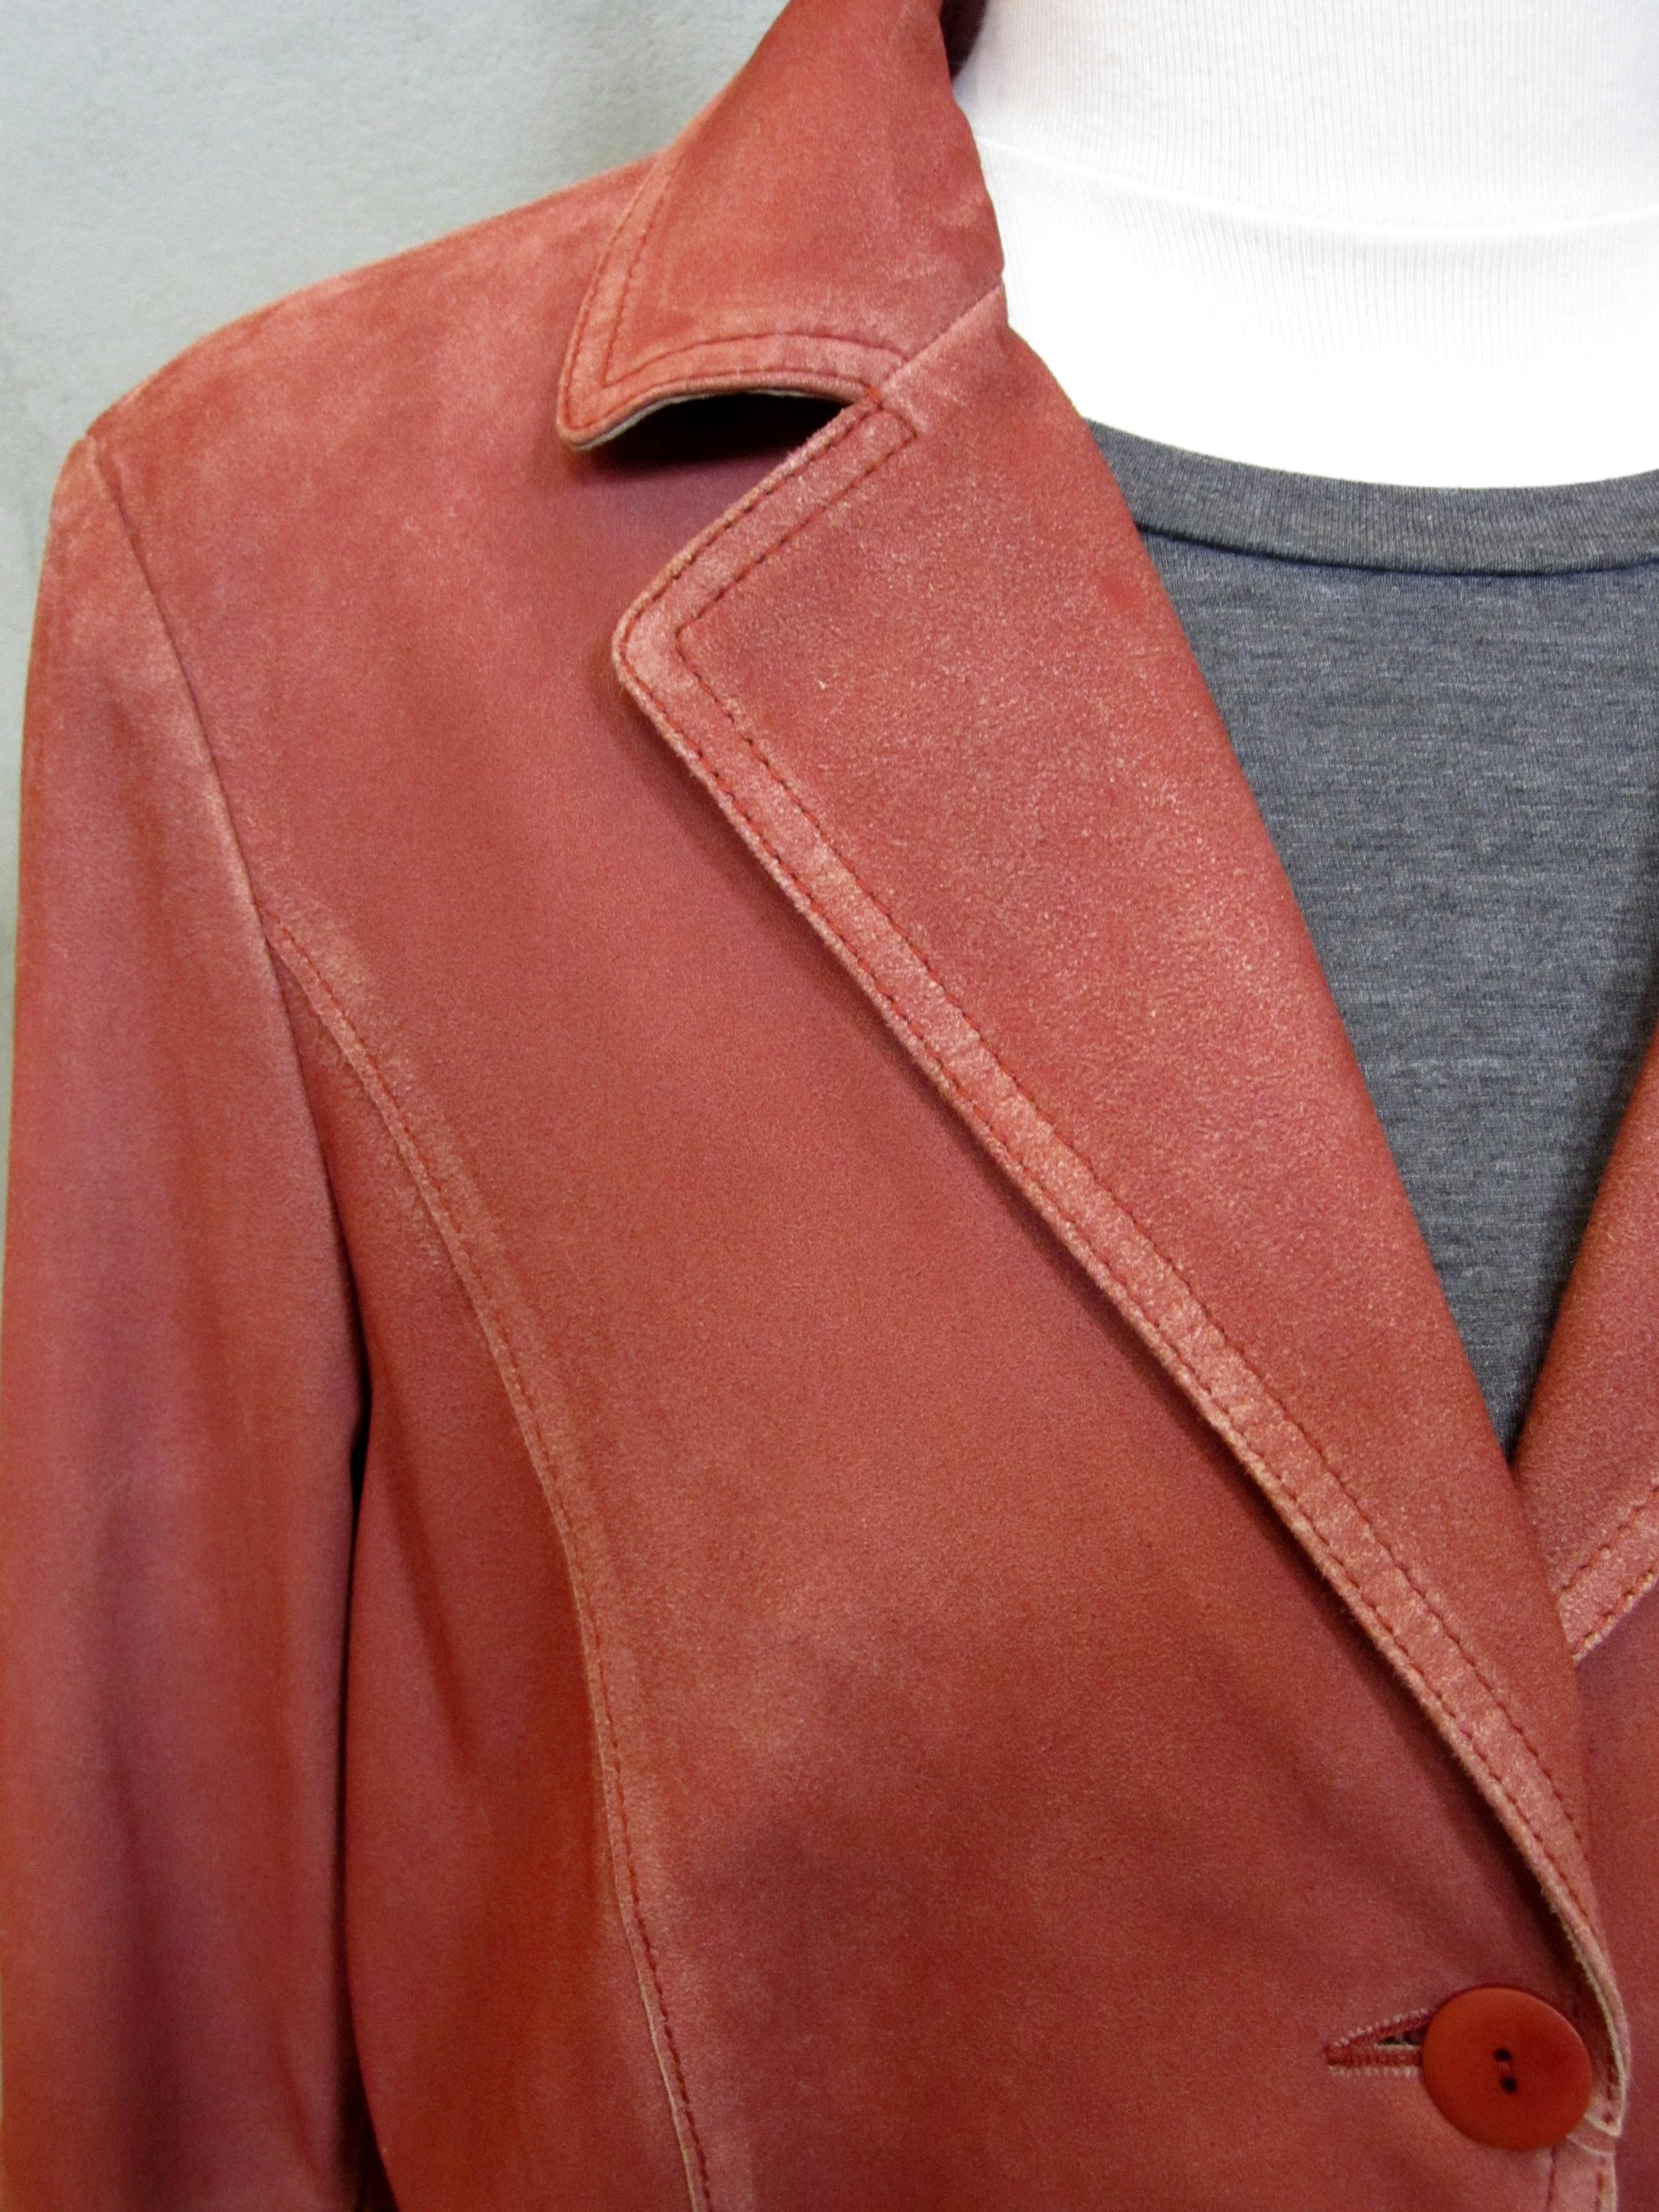 Gimo's Spring 2014 Suede Jacket closeup.